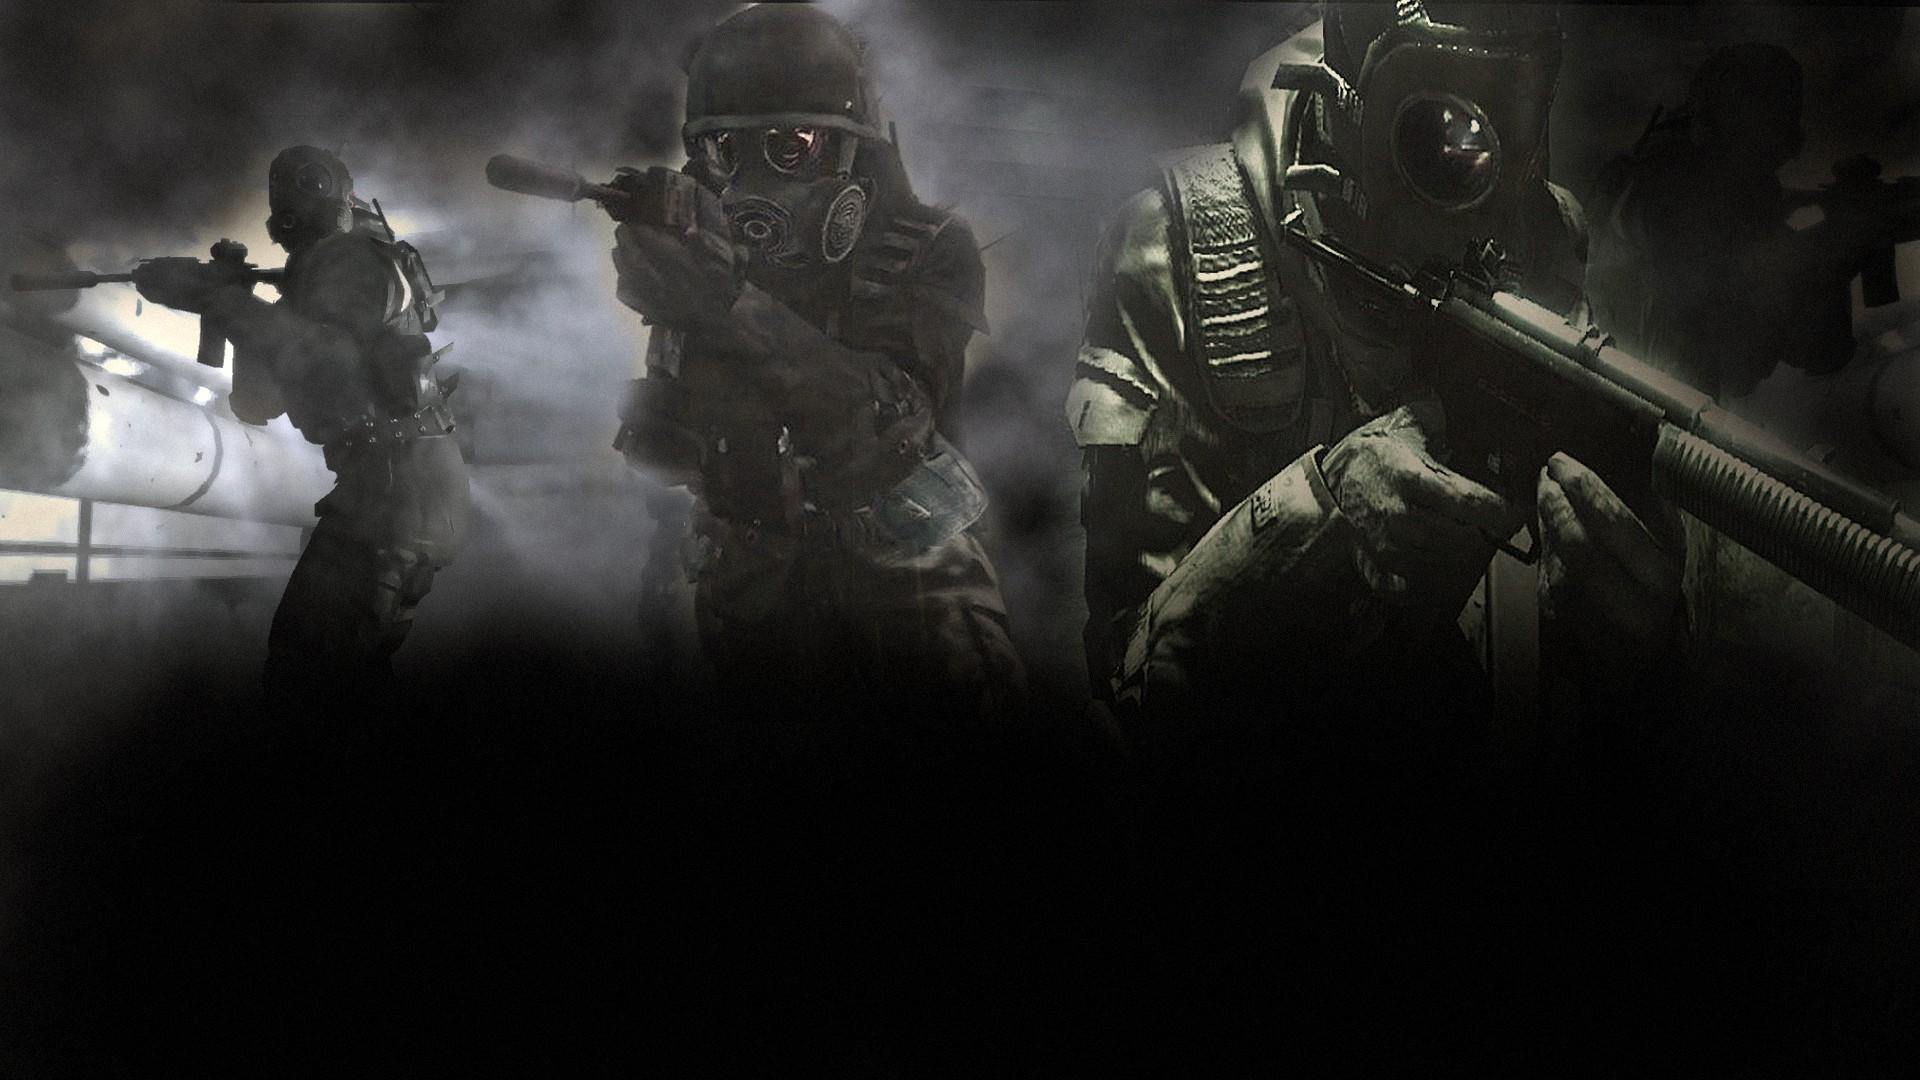 Call of duty 4 modern warfare wallpapers wallpaper cave - Call of duty warfare wallpaper ...